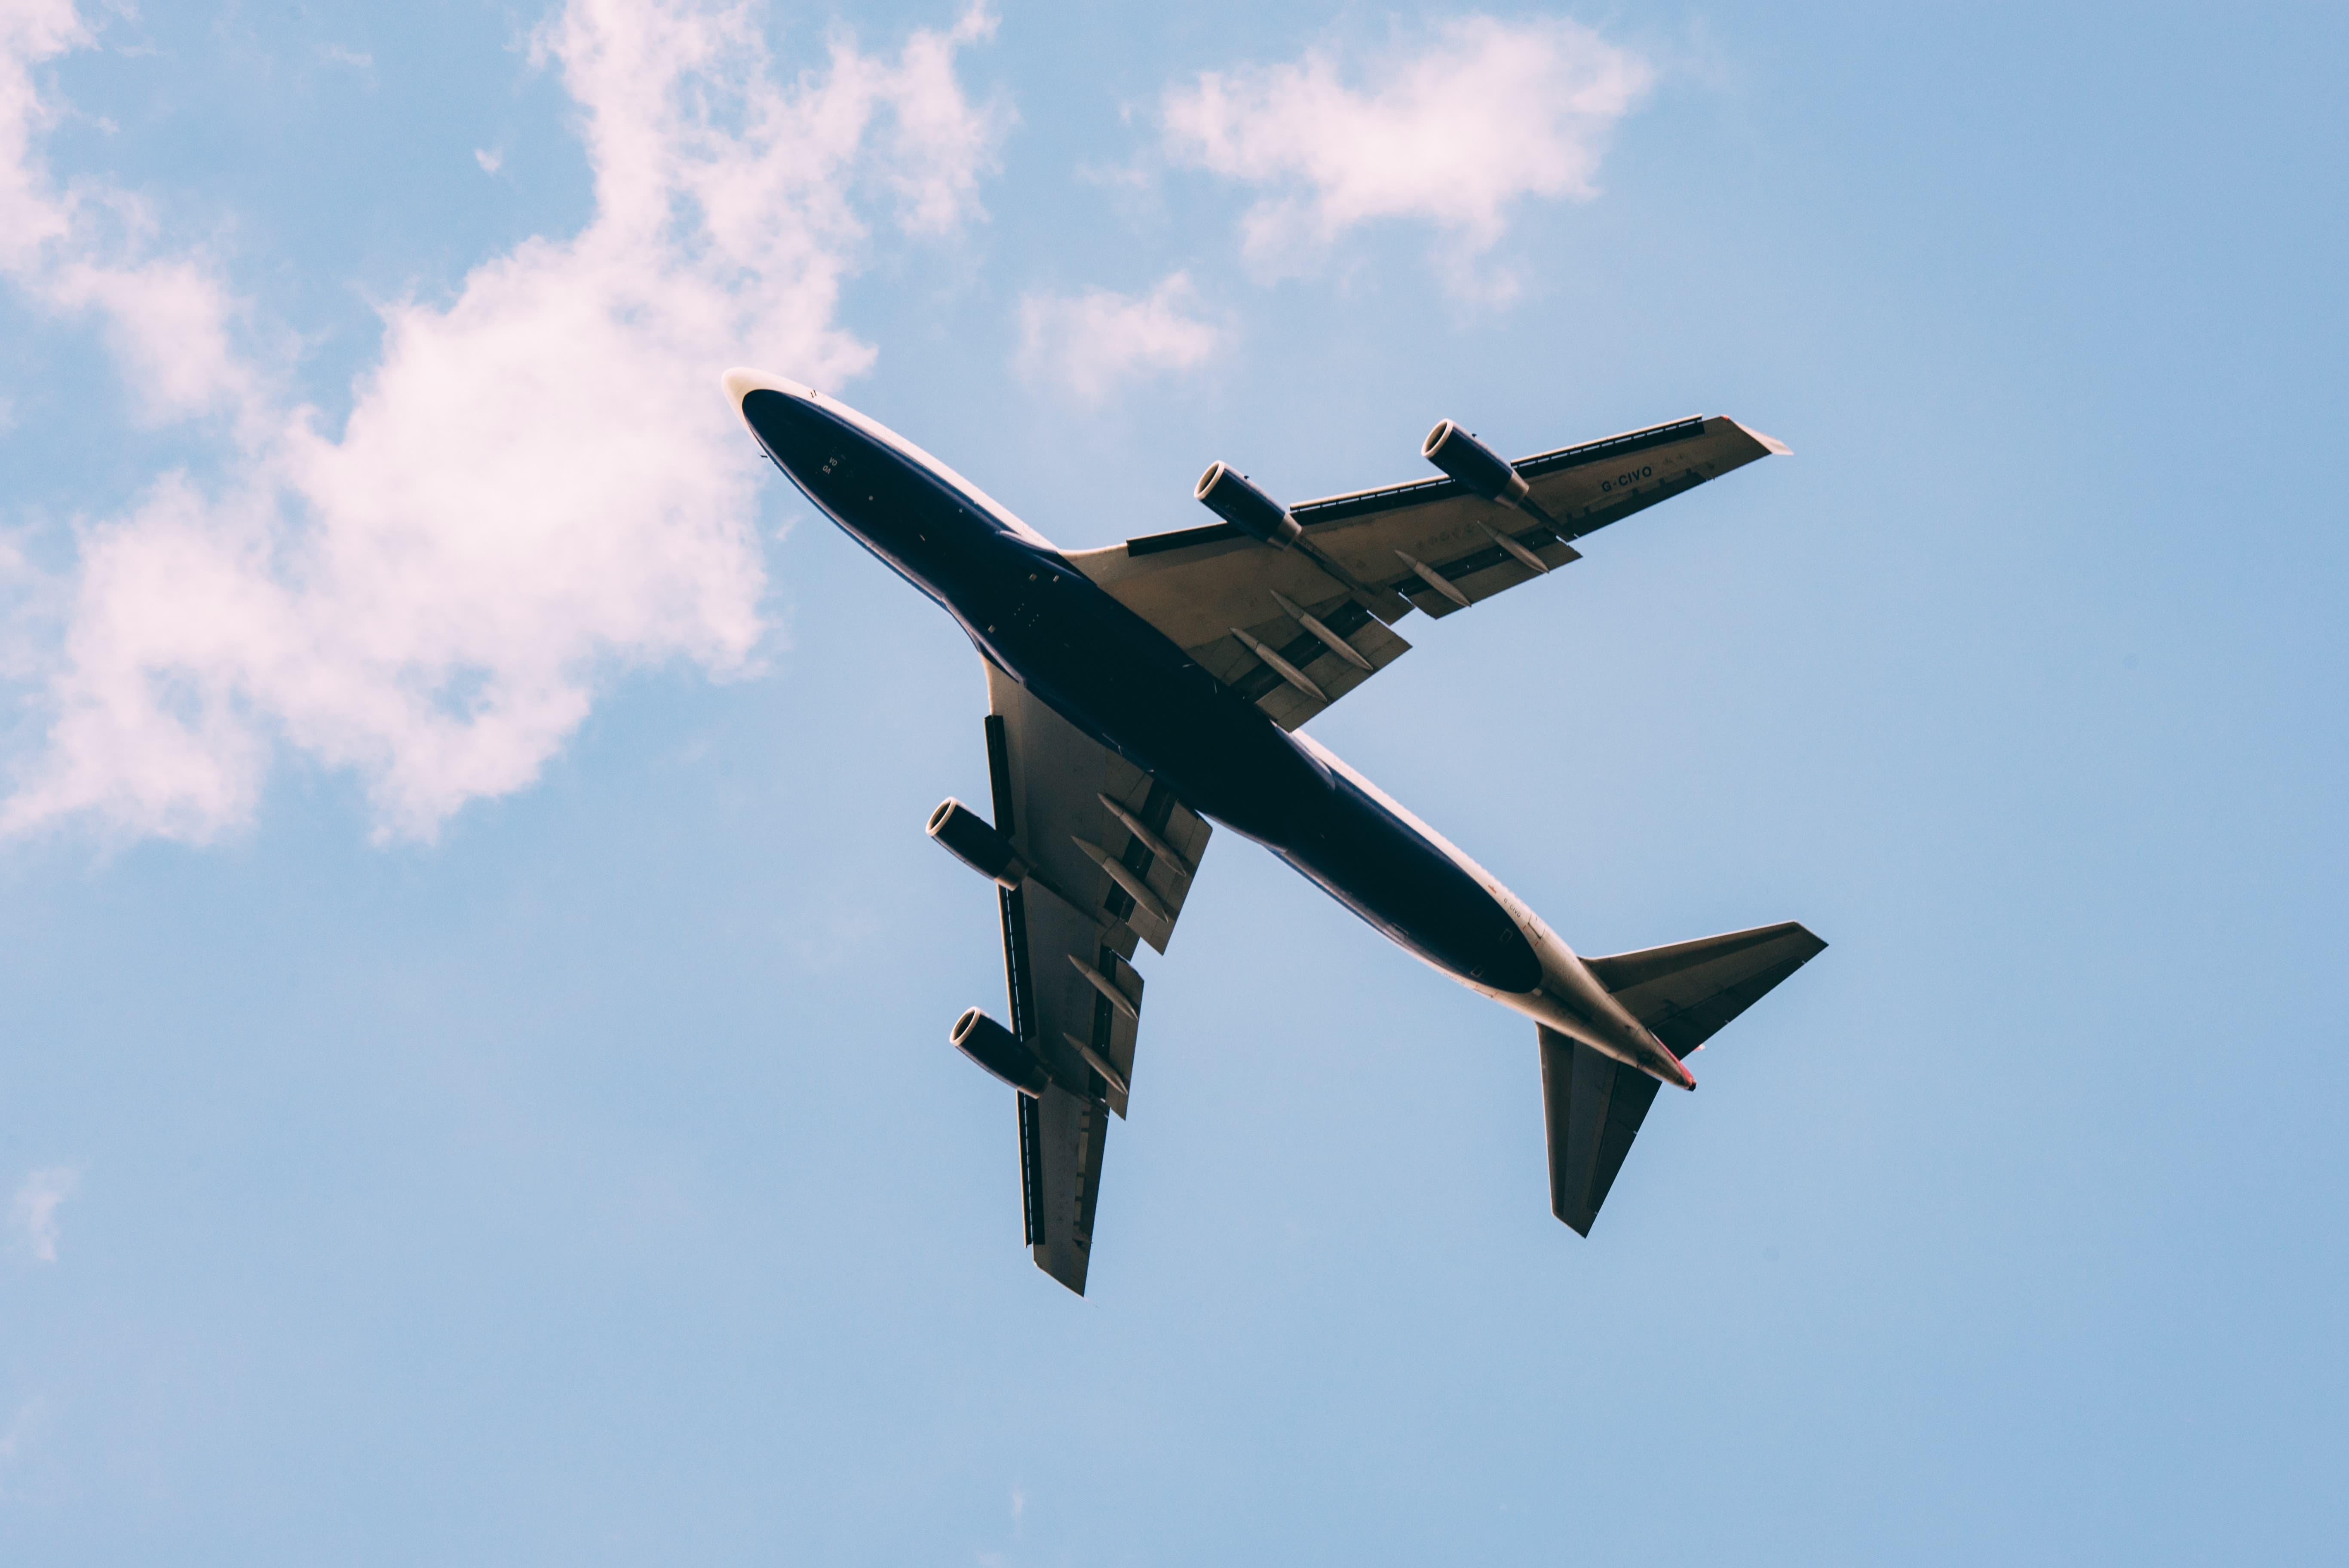 service transfert aéroport Tamatave Calypso Hotel & spa